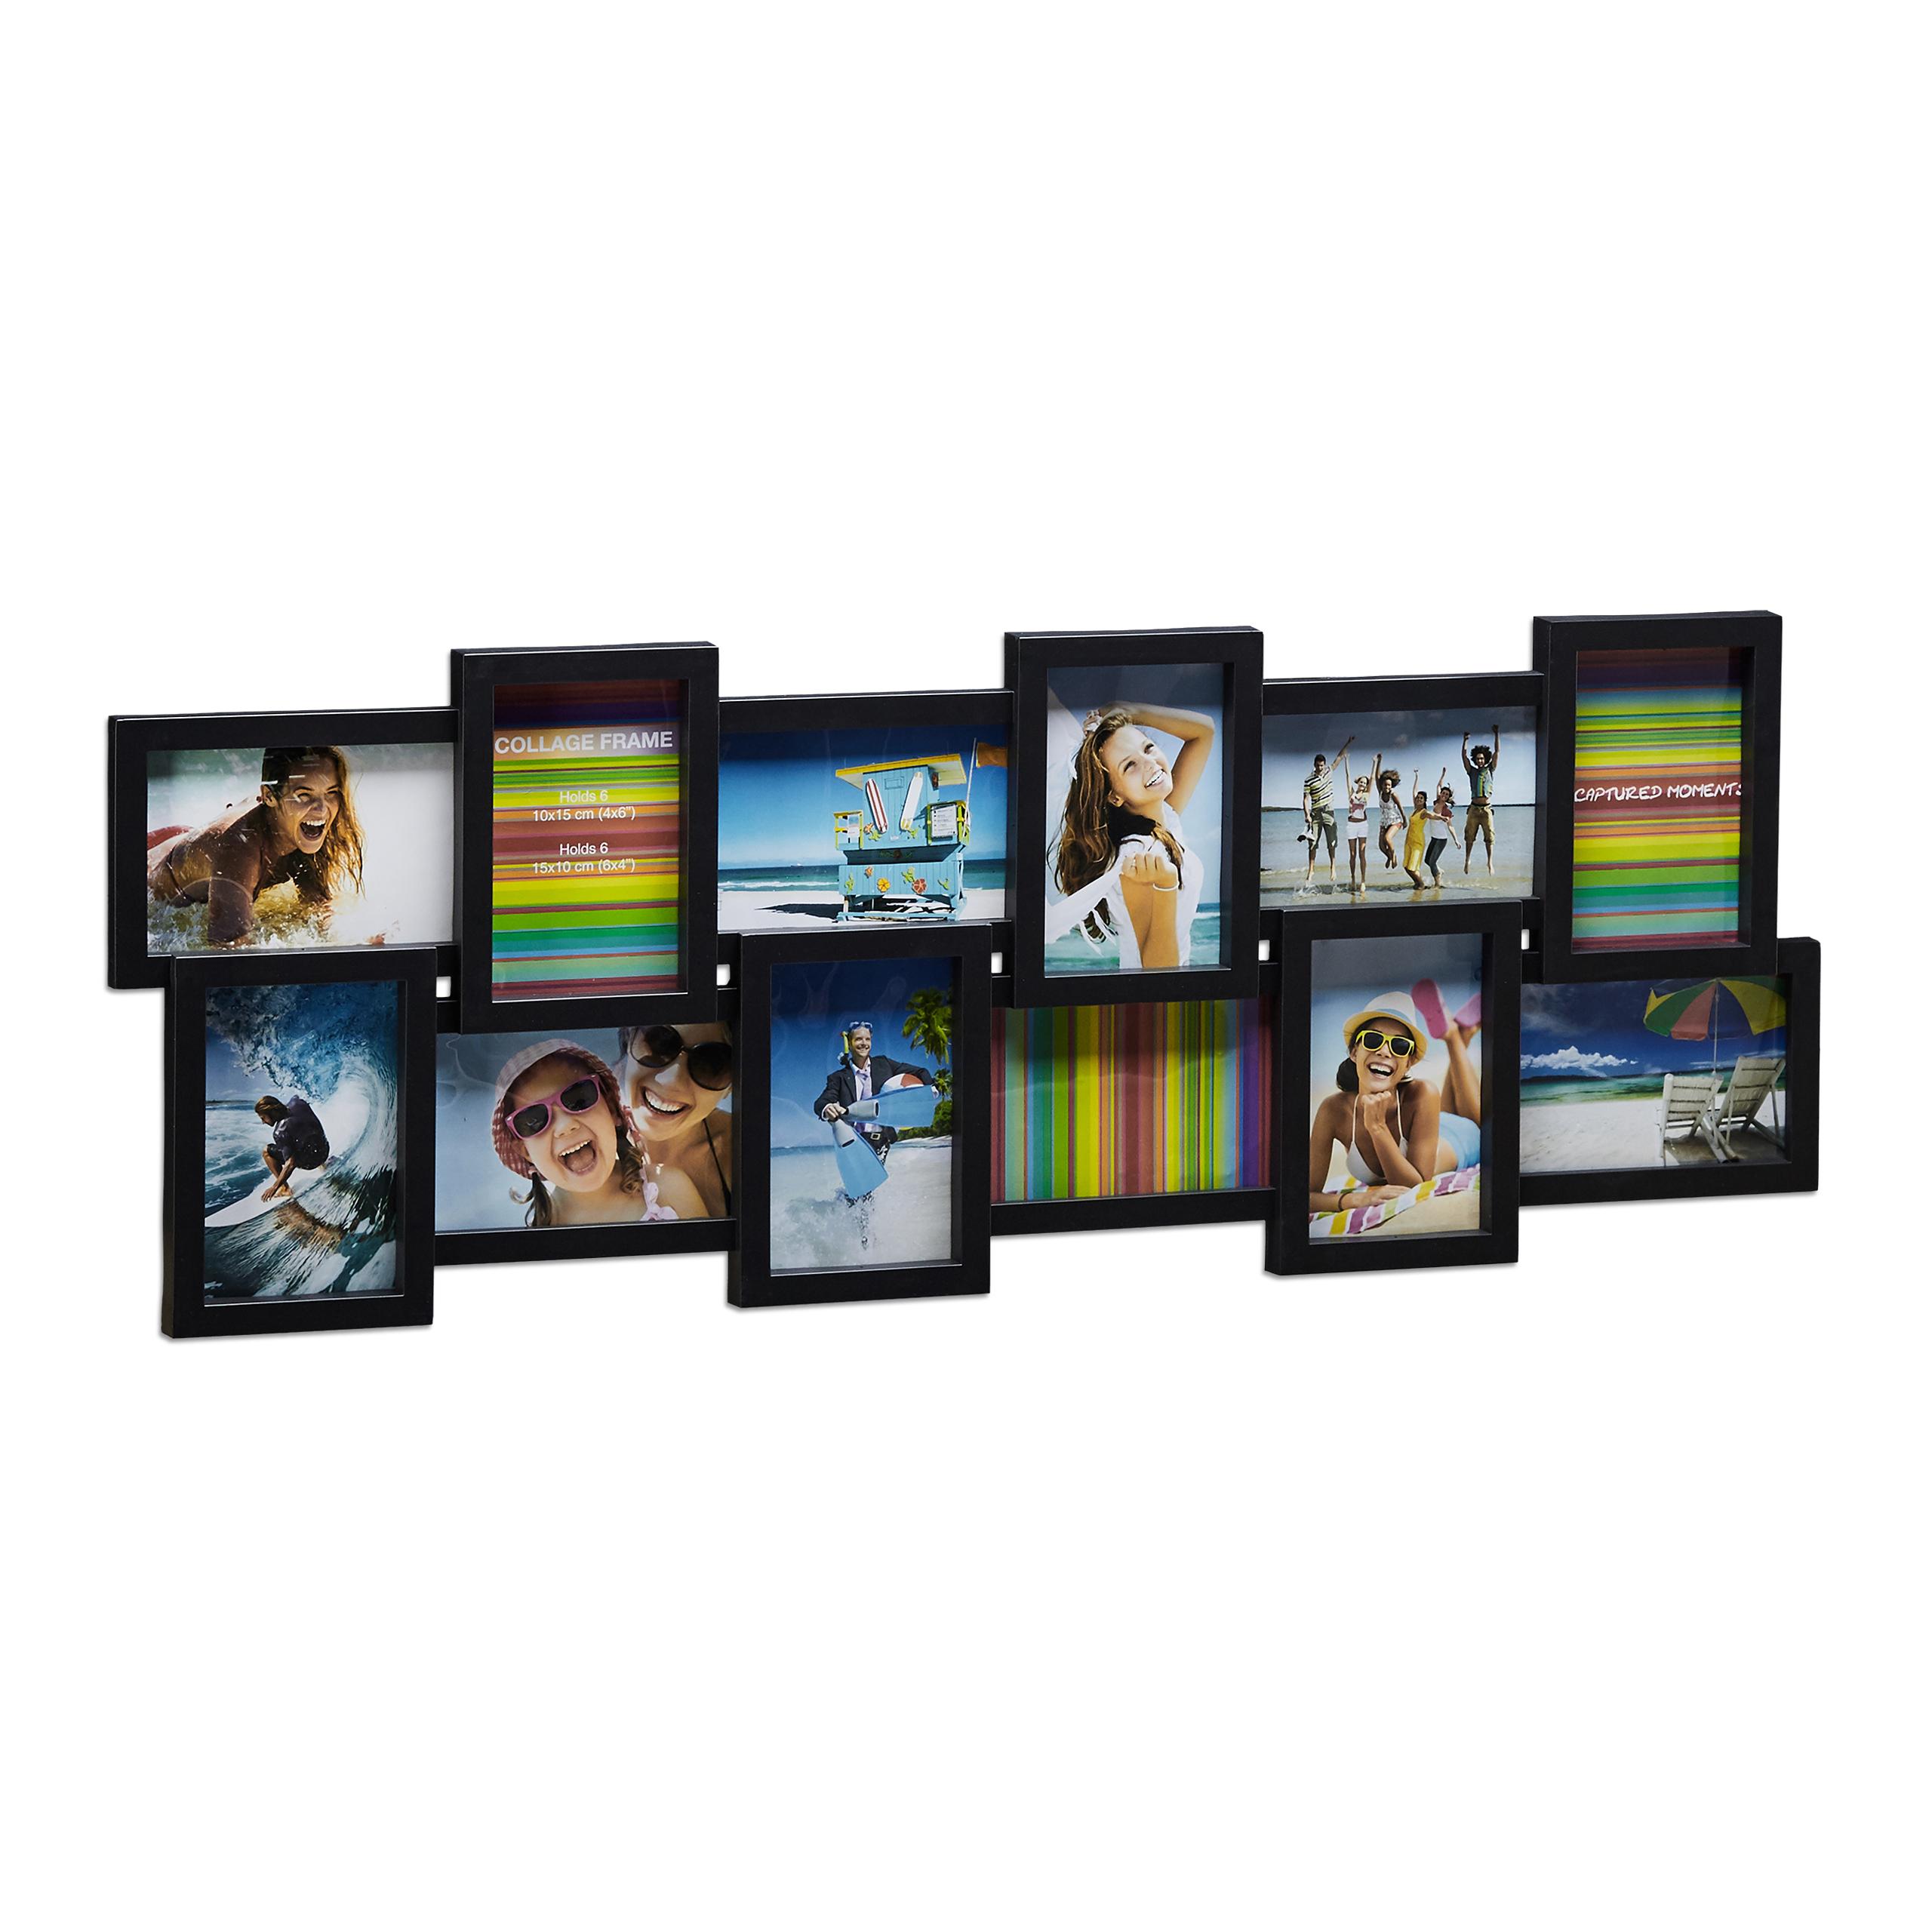 Marco-de-fotos-para-12-fotografias-galeria-imagenes-collage-multiple